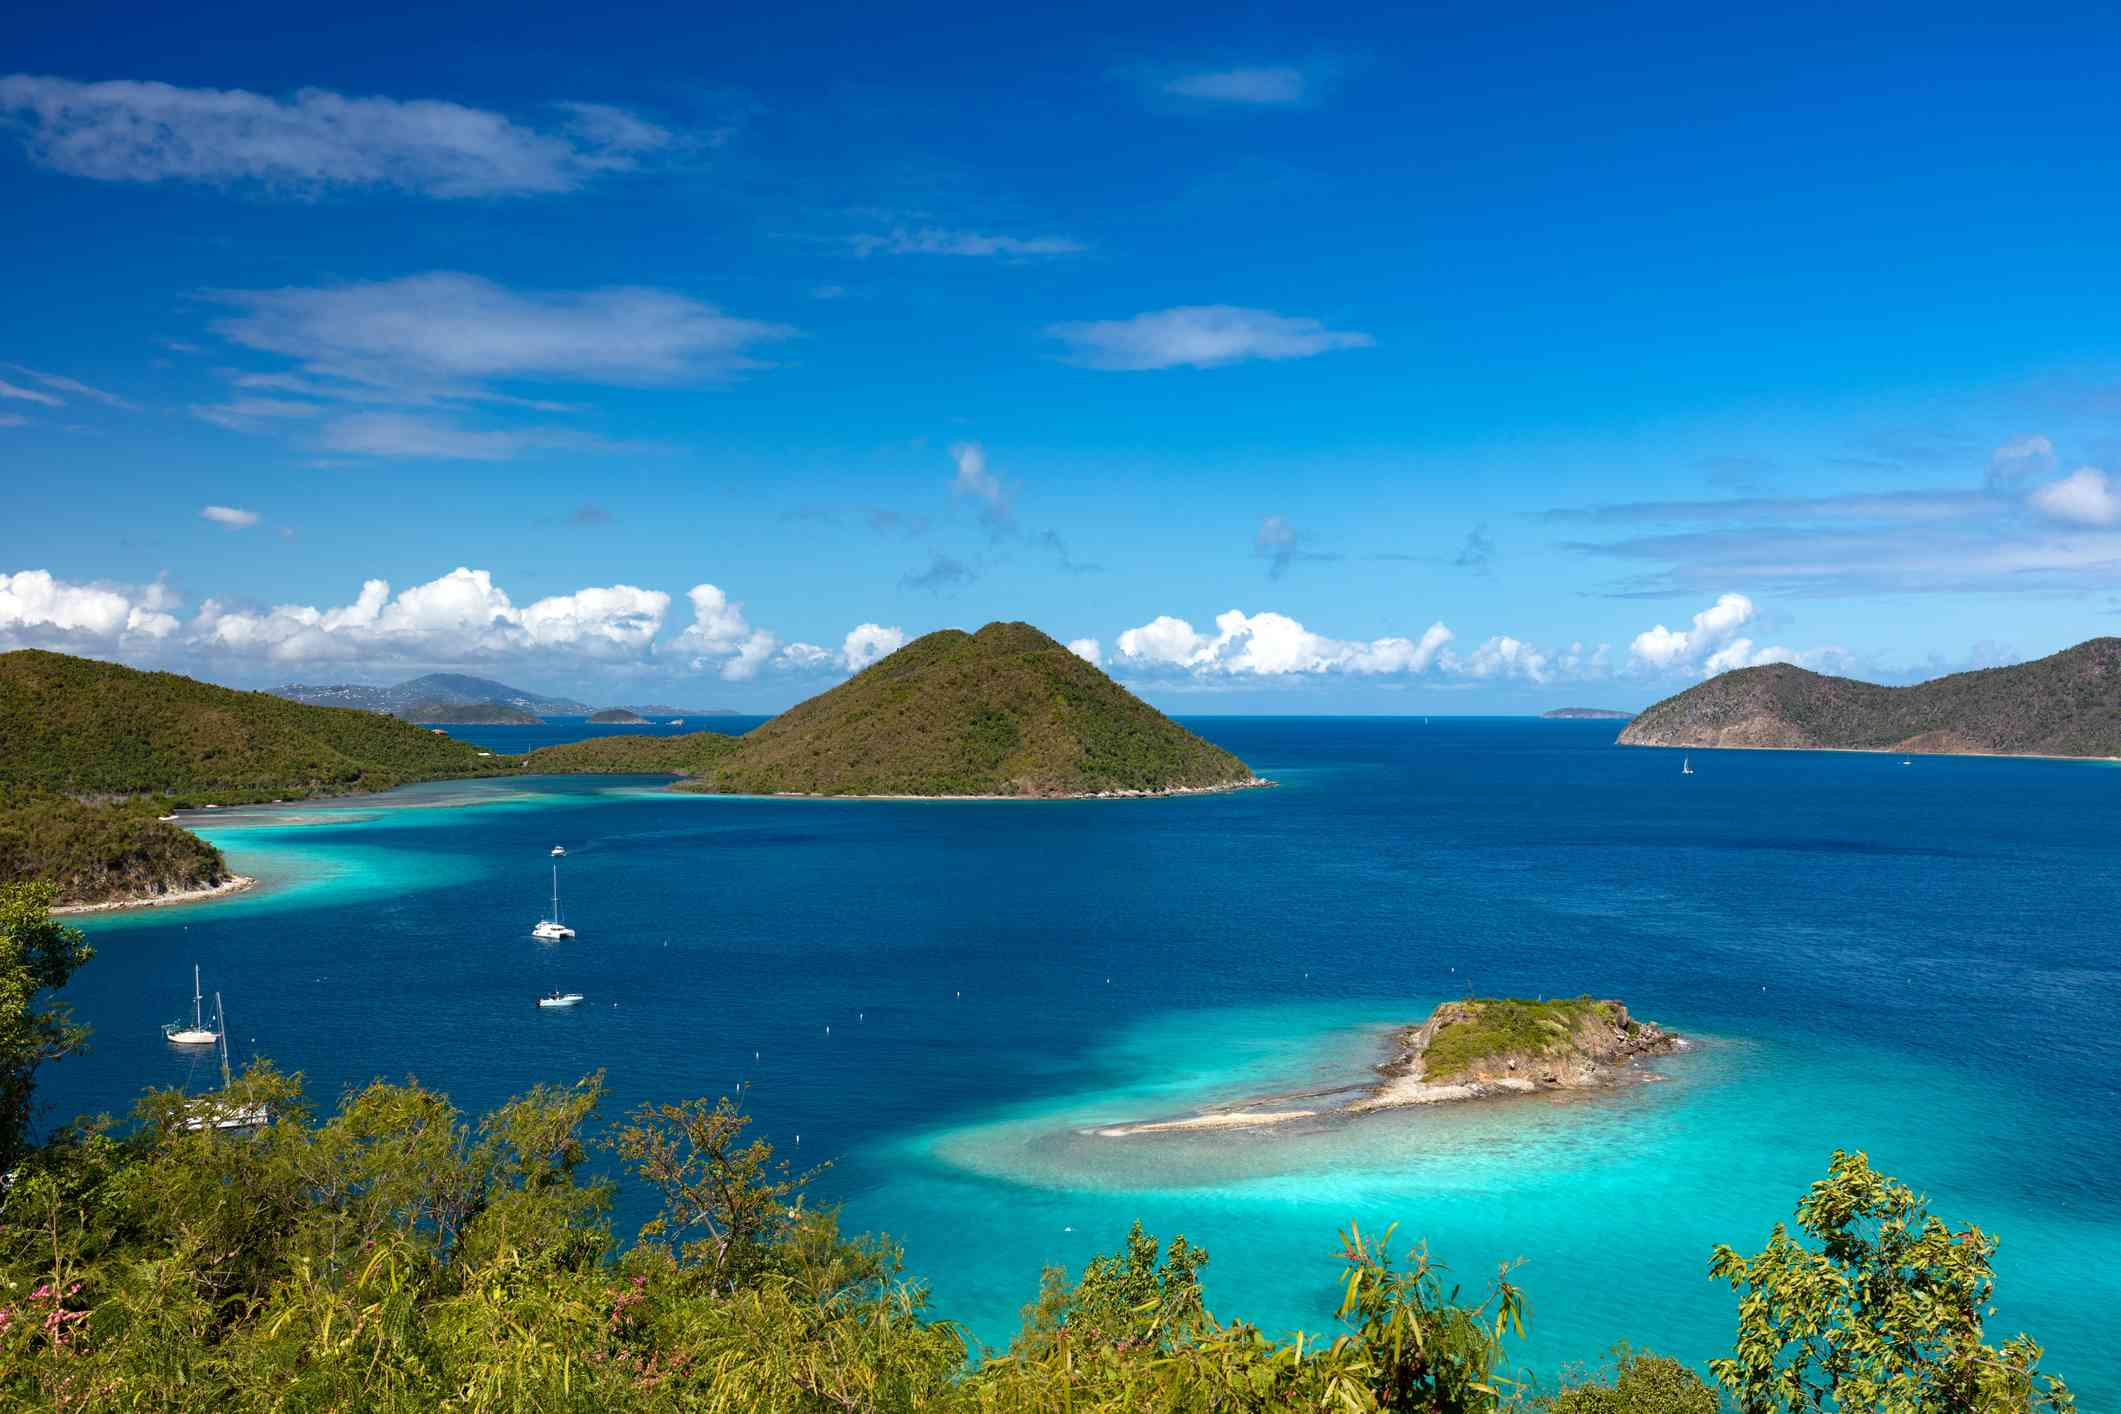 Waterlemon Cay, Virgin Islands National Park